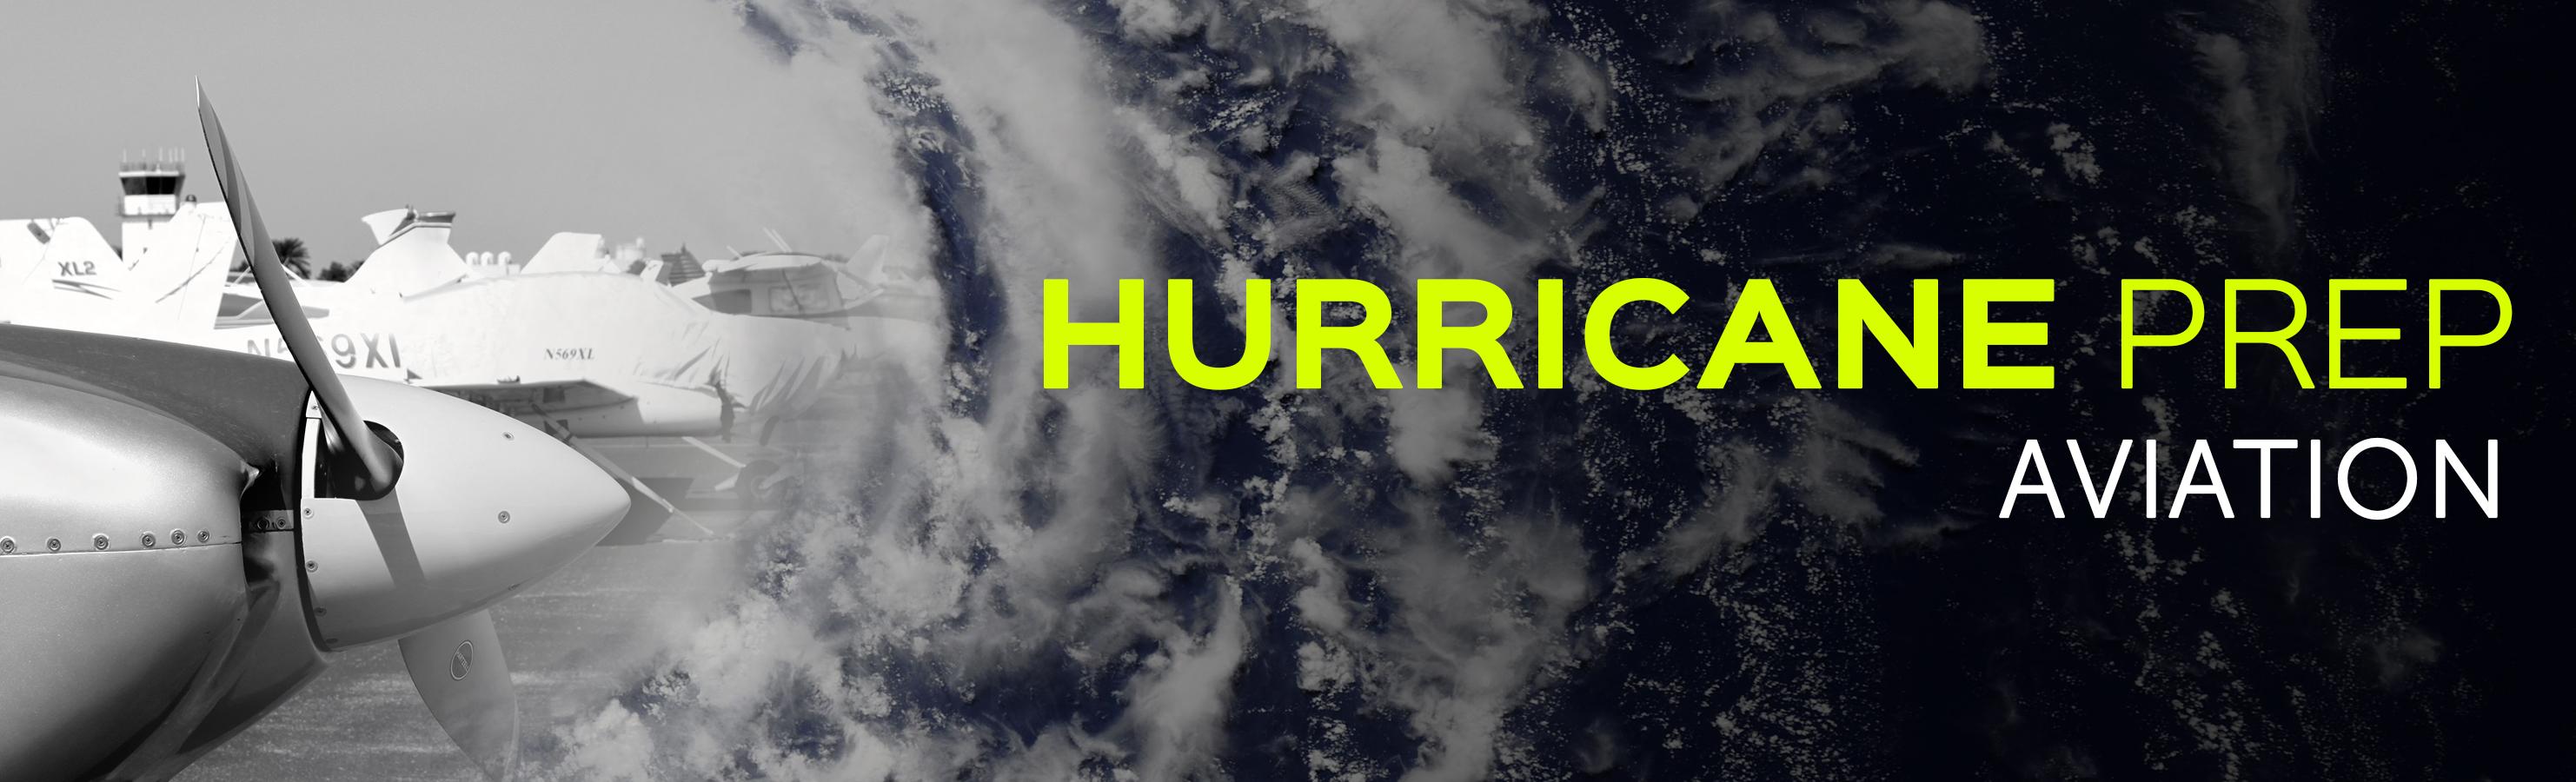 Acr   hurricane prep   aviation   lead